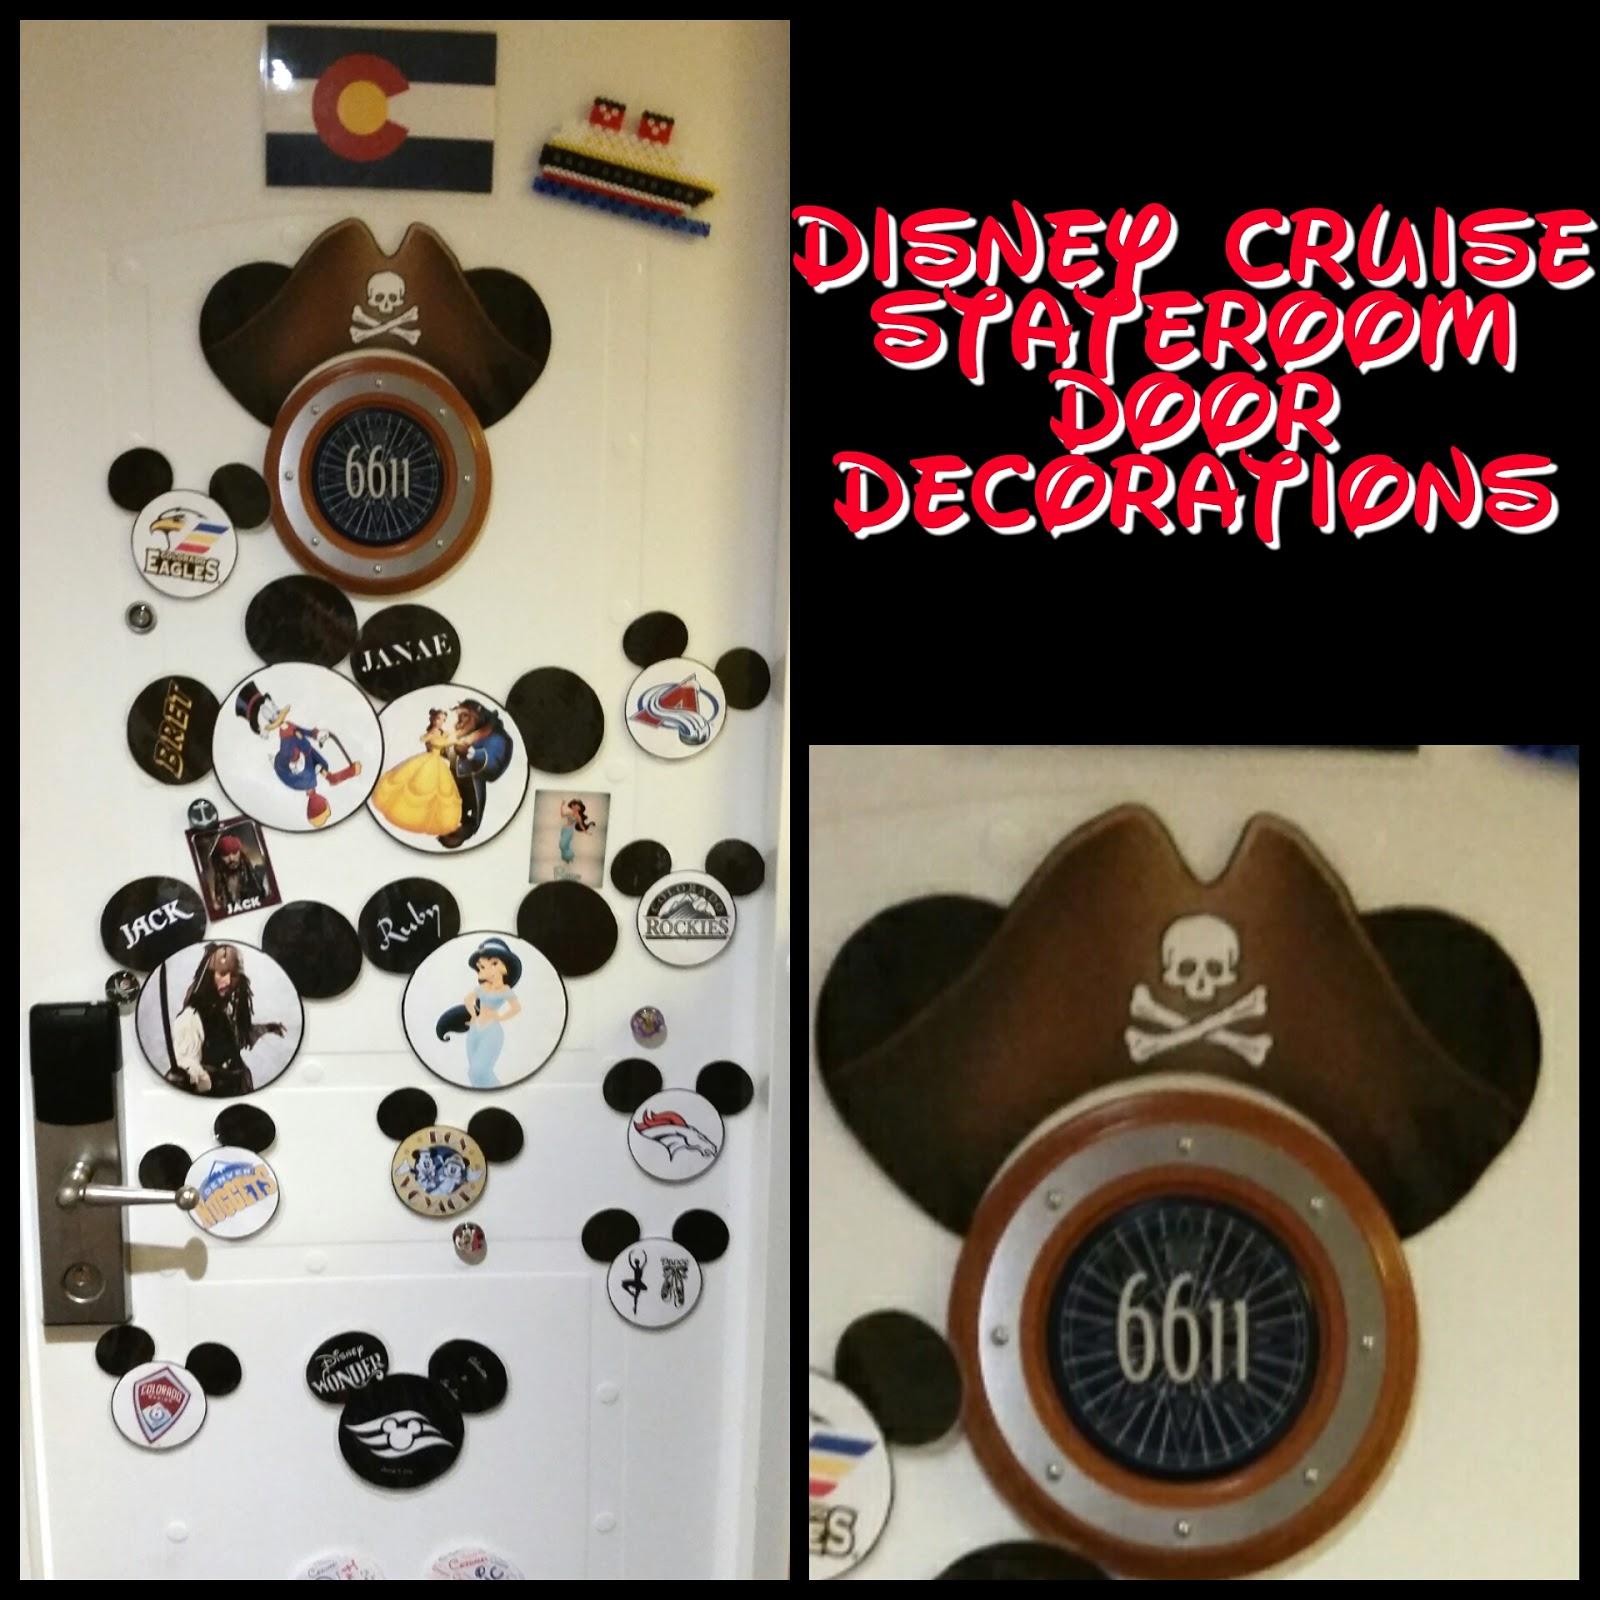 Disney Cruise Door Decorations